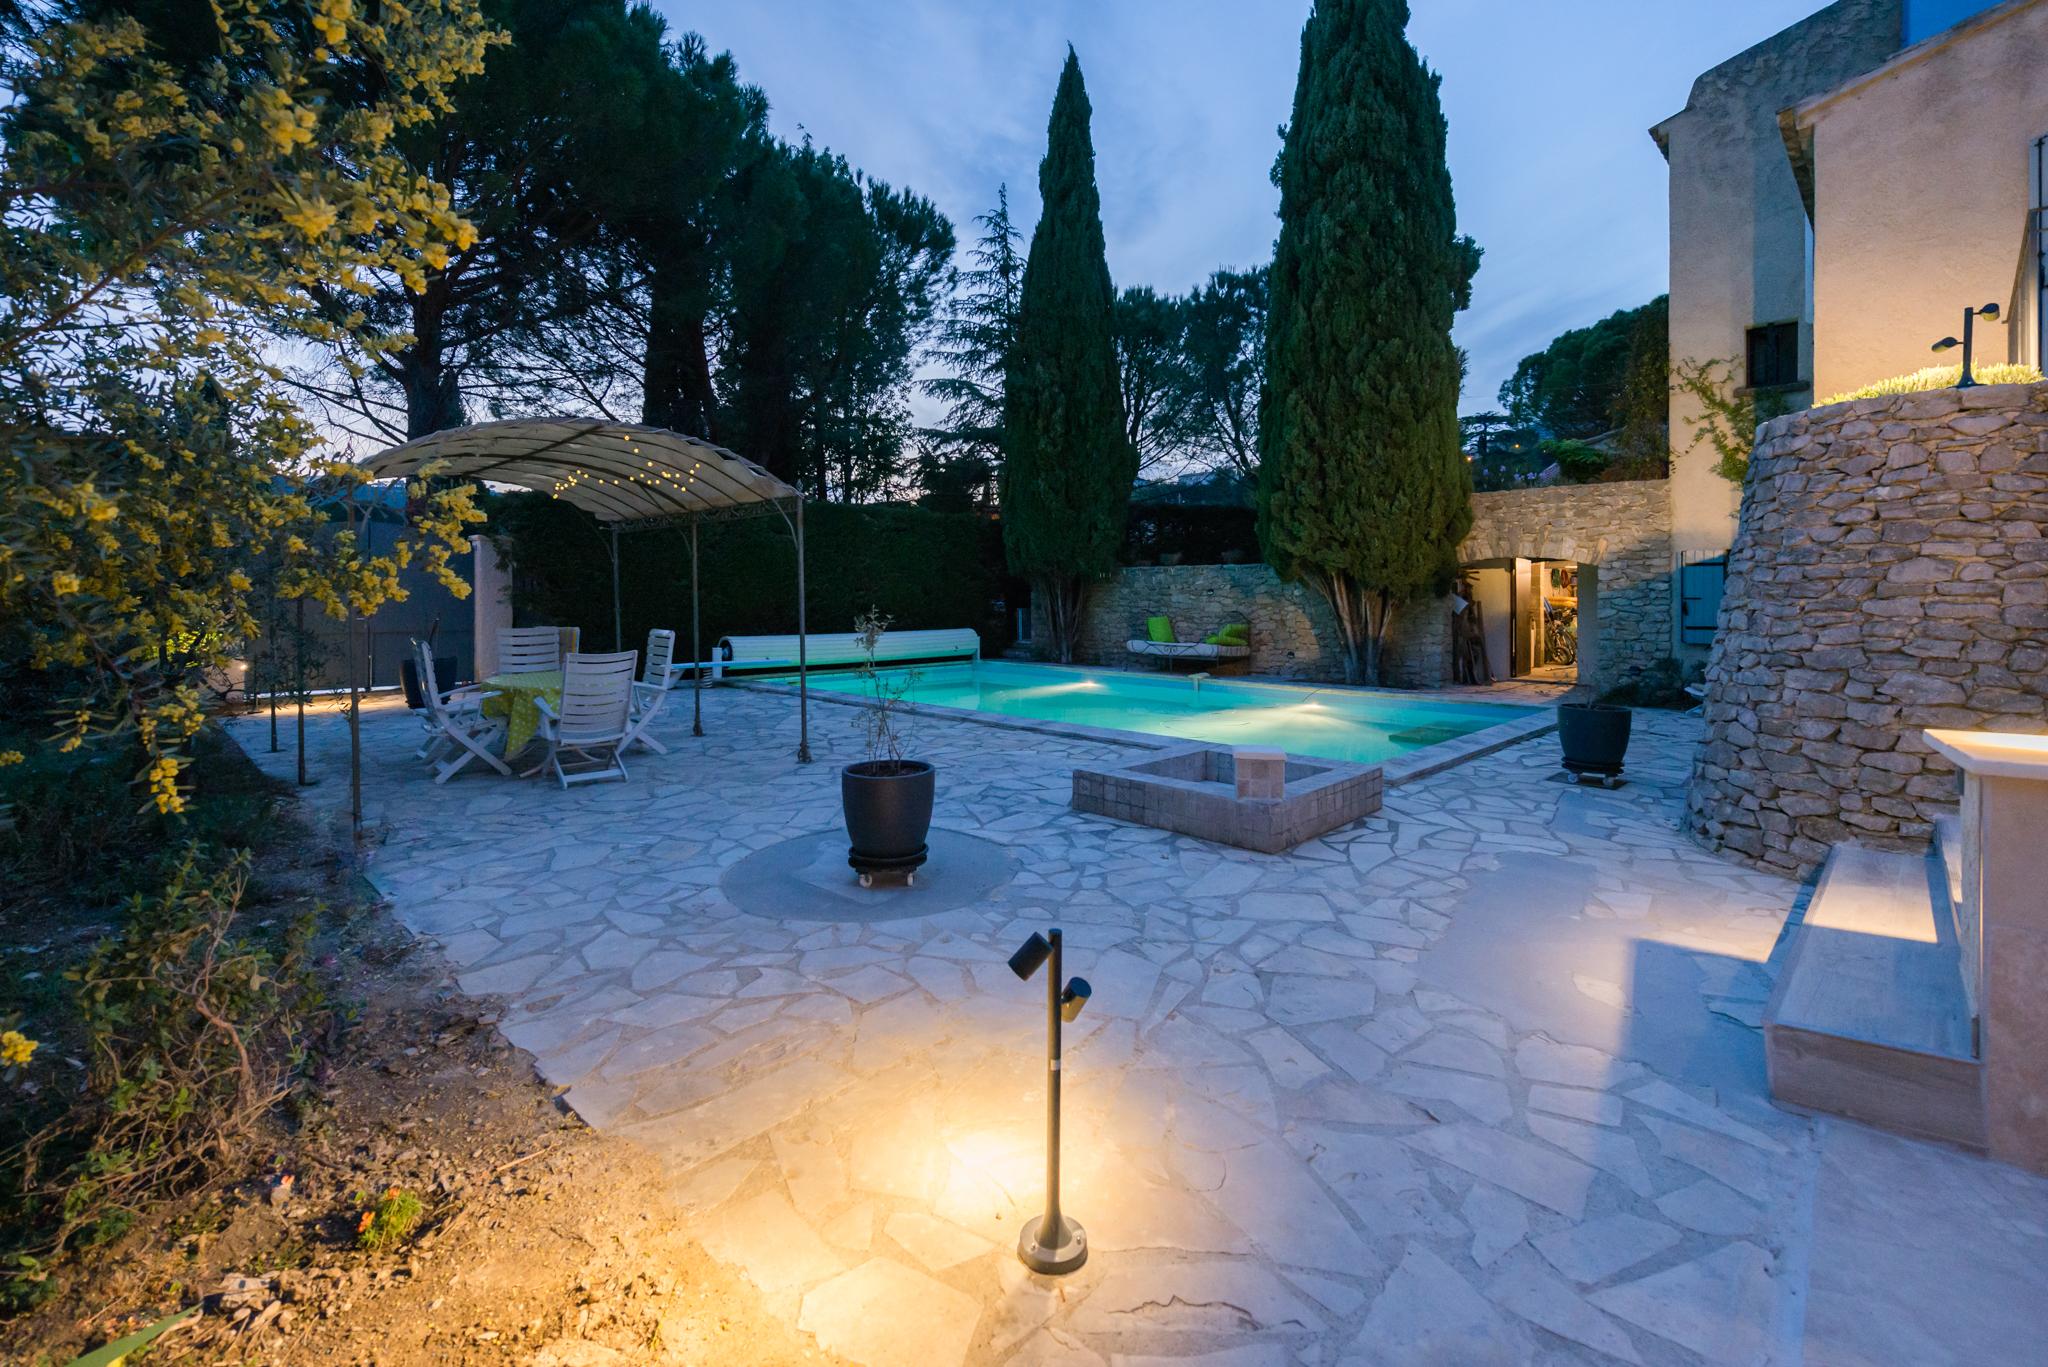 feriebolig-frankrig-sauna-pool-DSC_4814.jpg